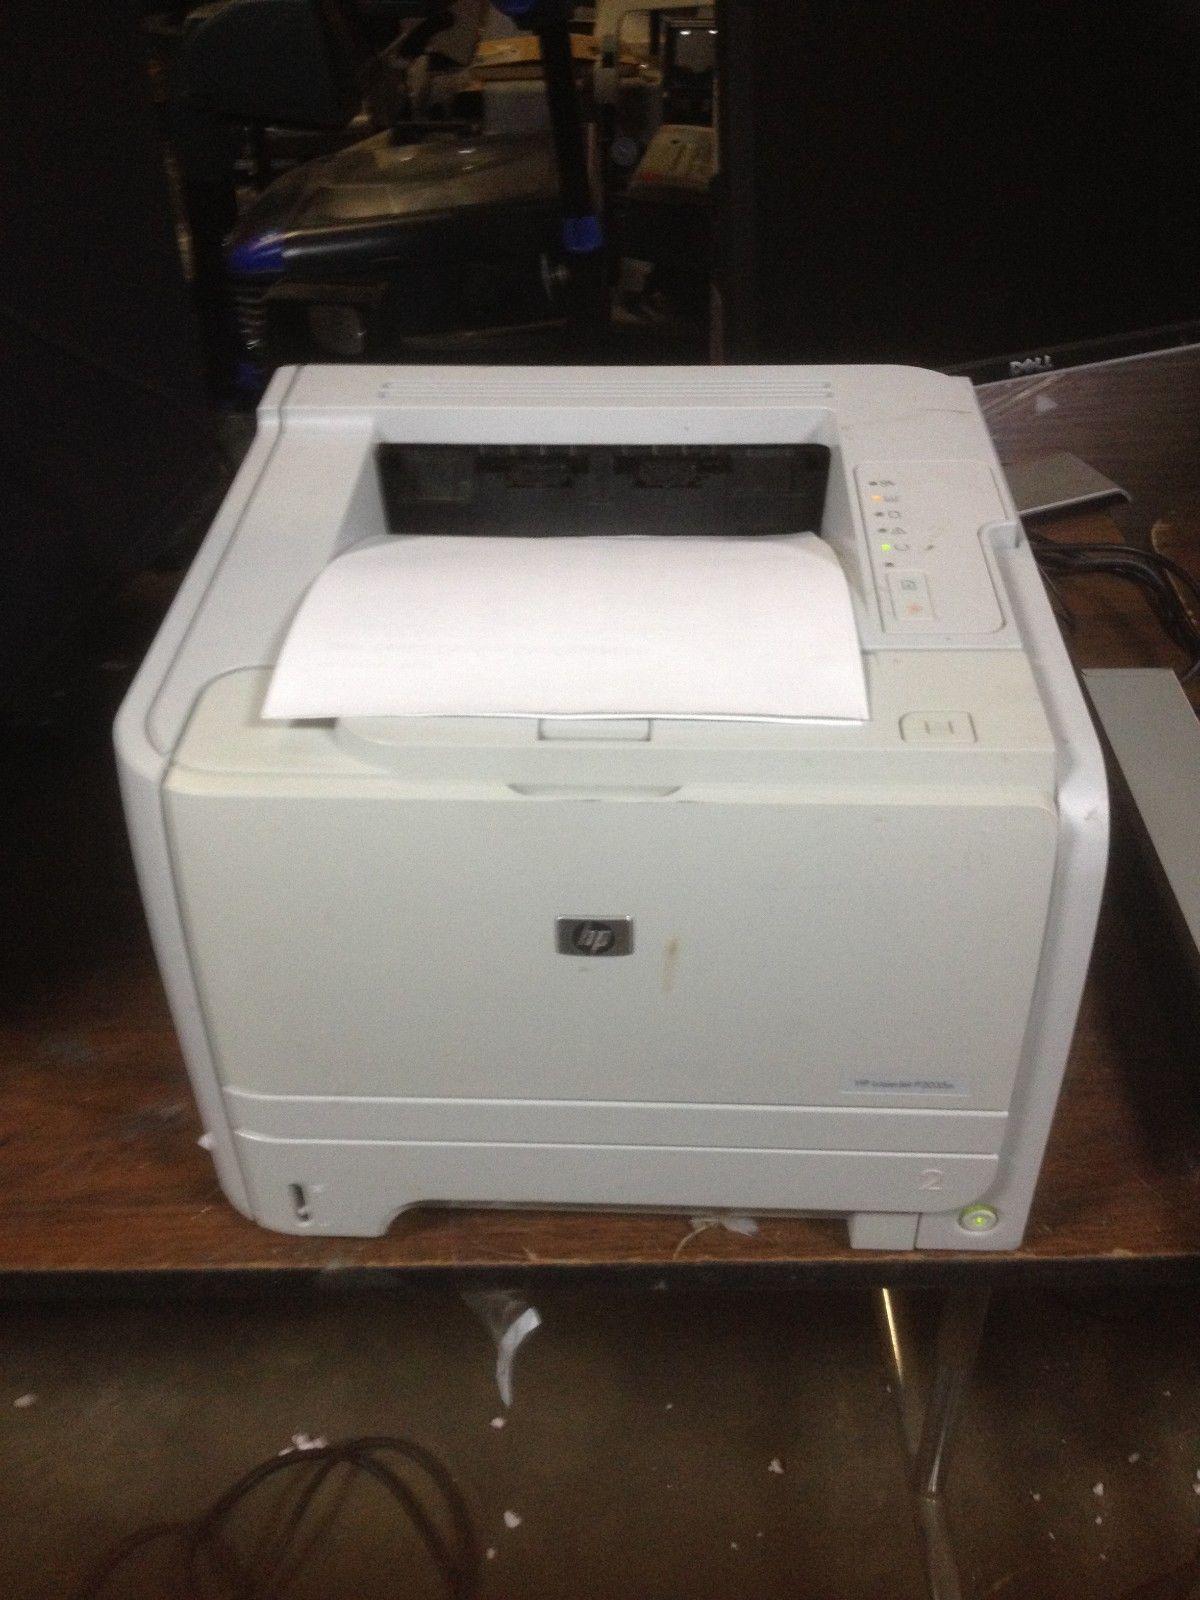 Hp Laserjet P2035n Workgroup Laser Printer P2035 Network